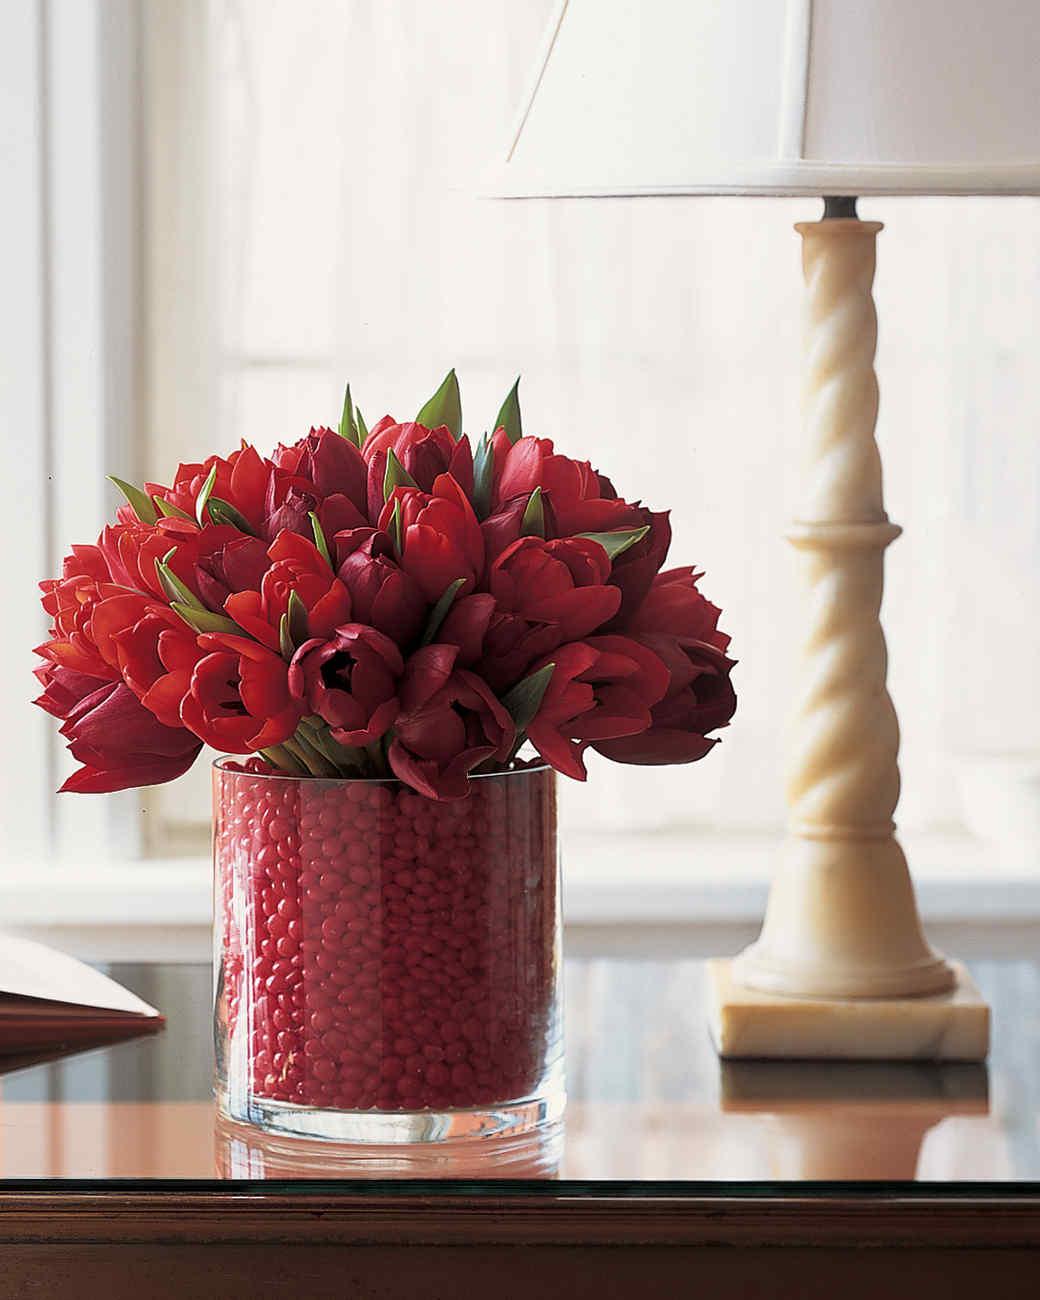 a100134_0204_tulip02.jpg